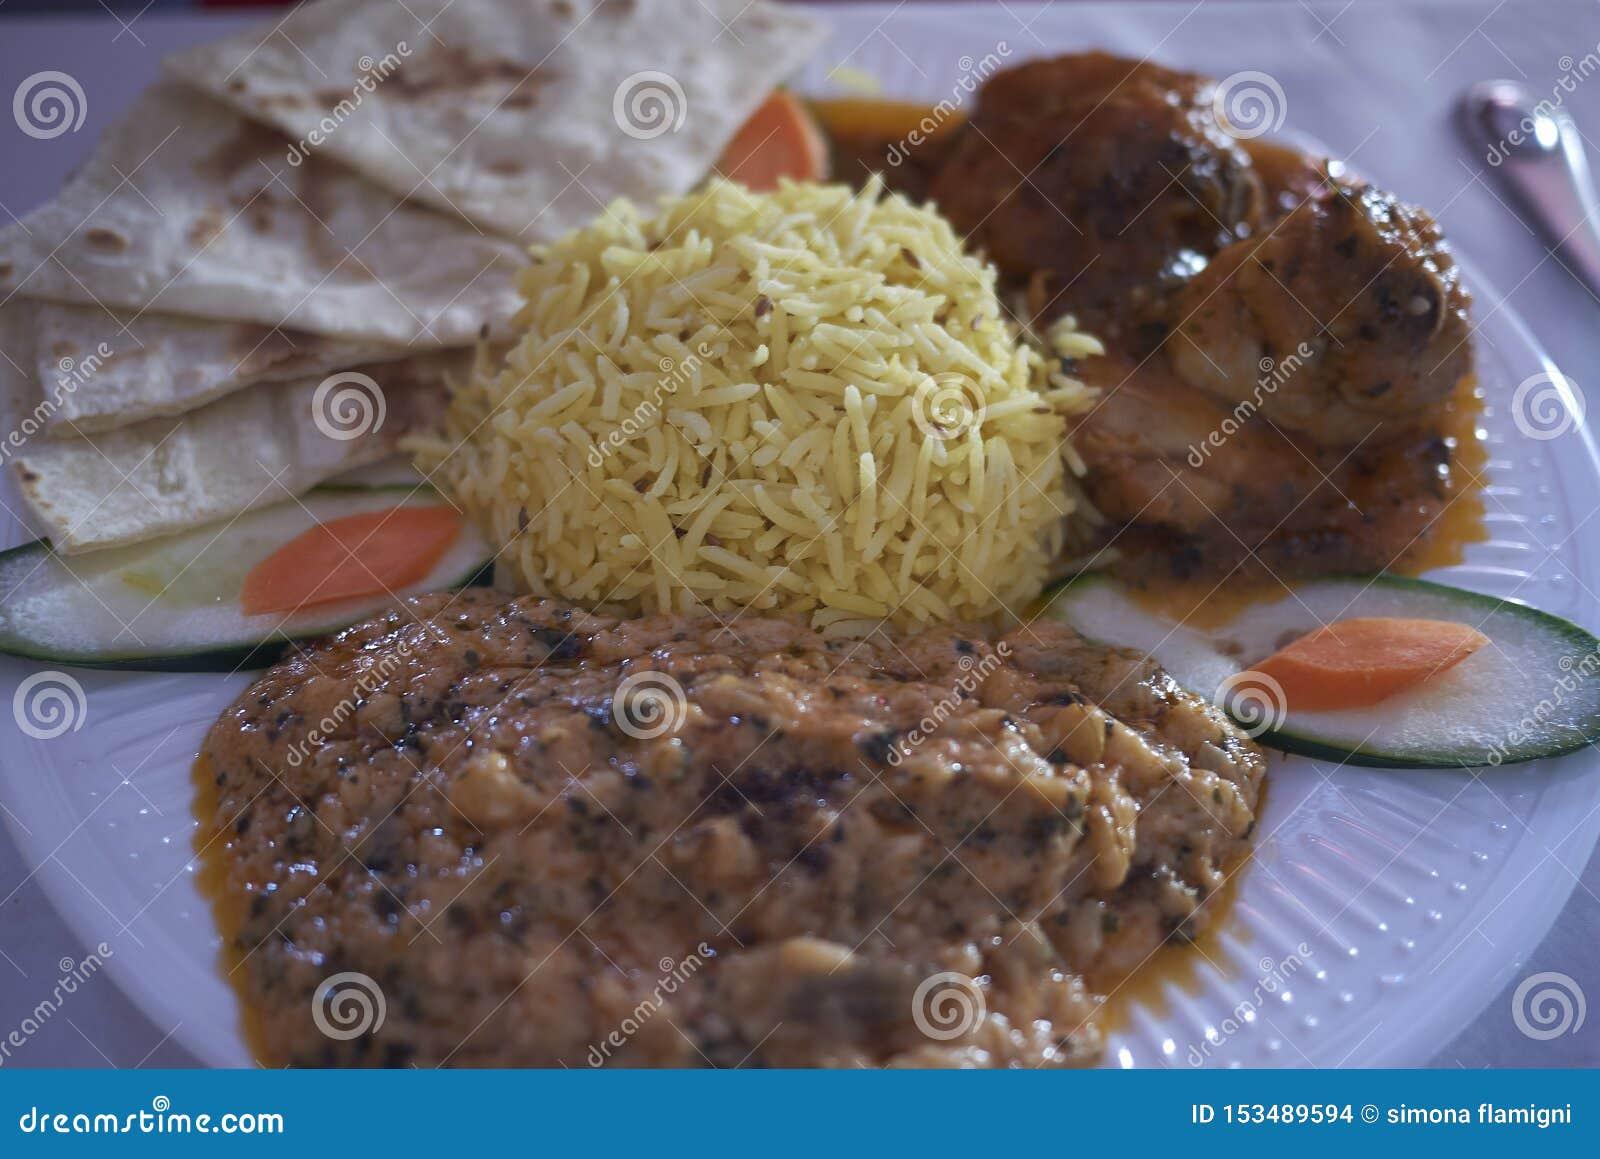 Repas indien avec du riz de basamati